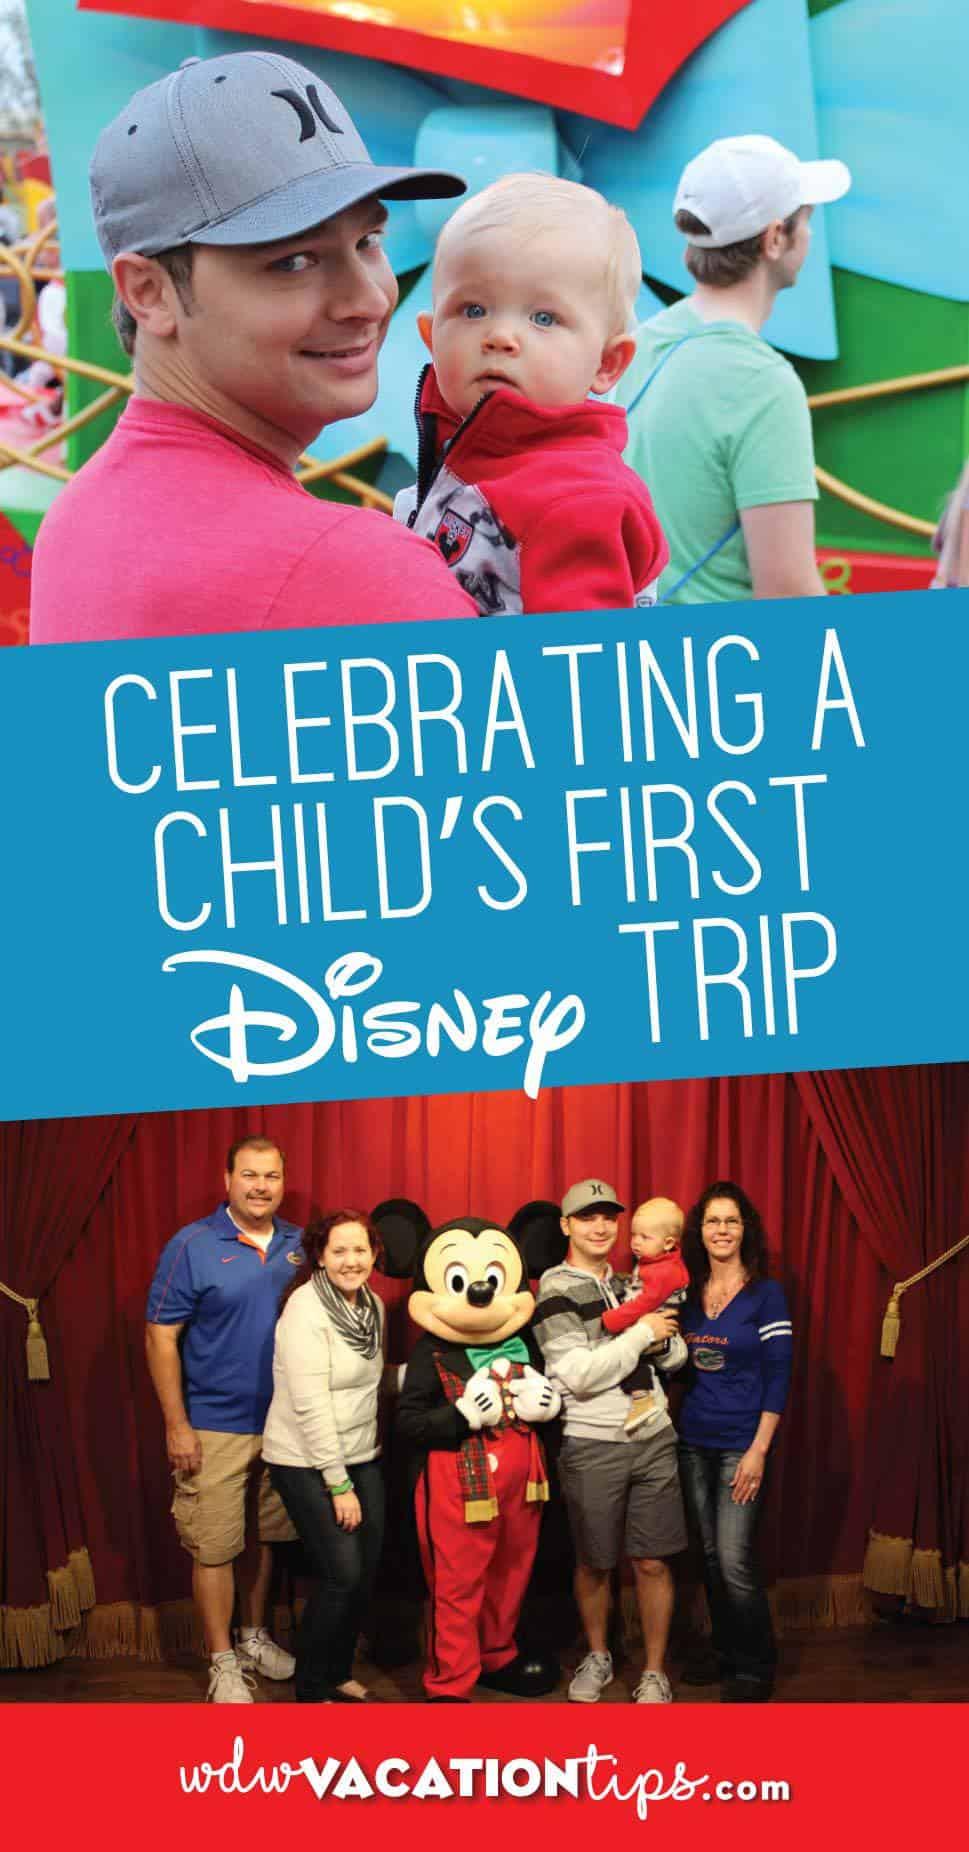 Celebrating a Childs First Disney Trip